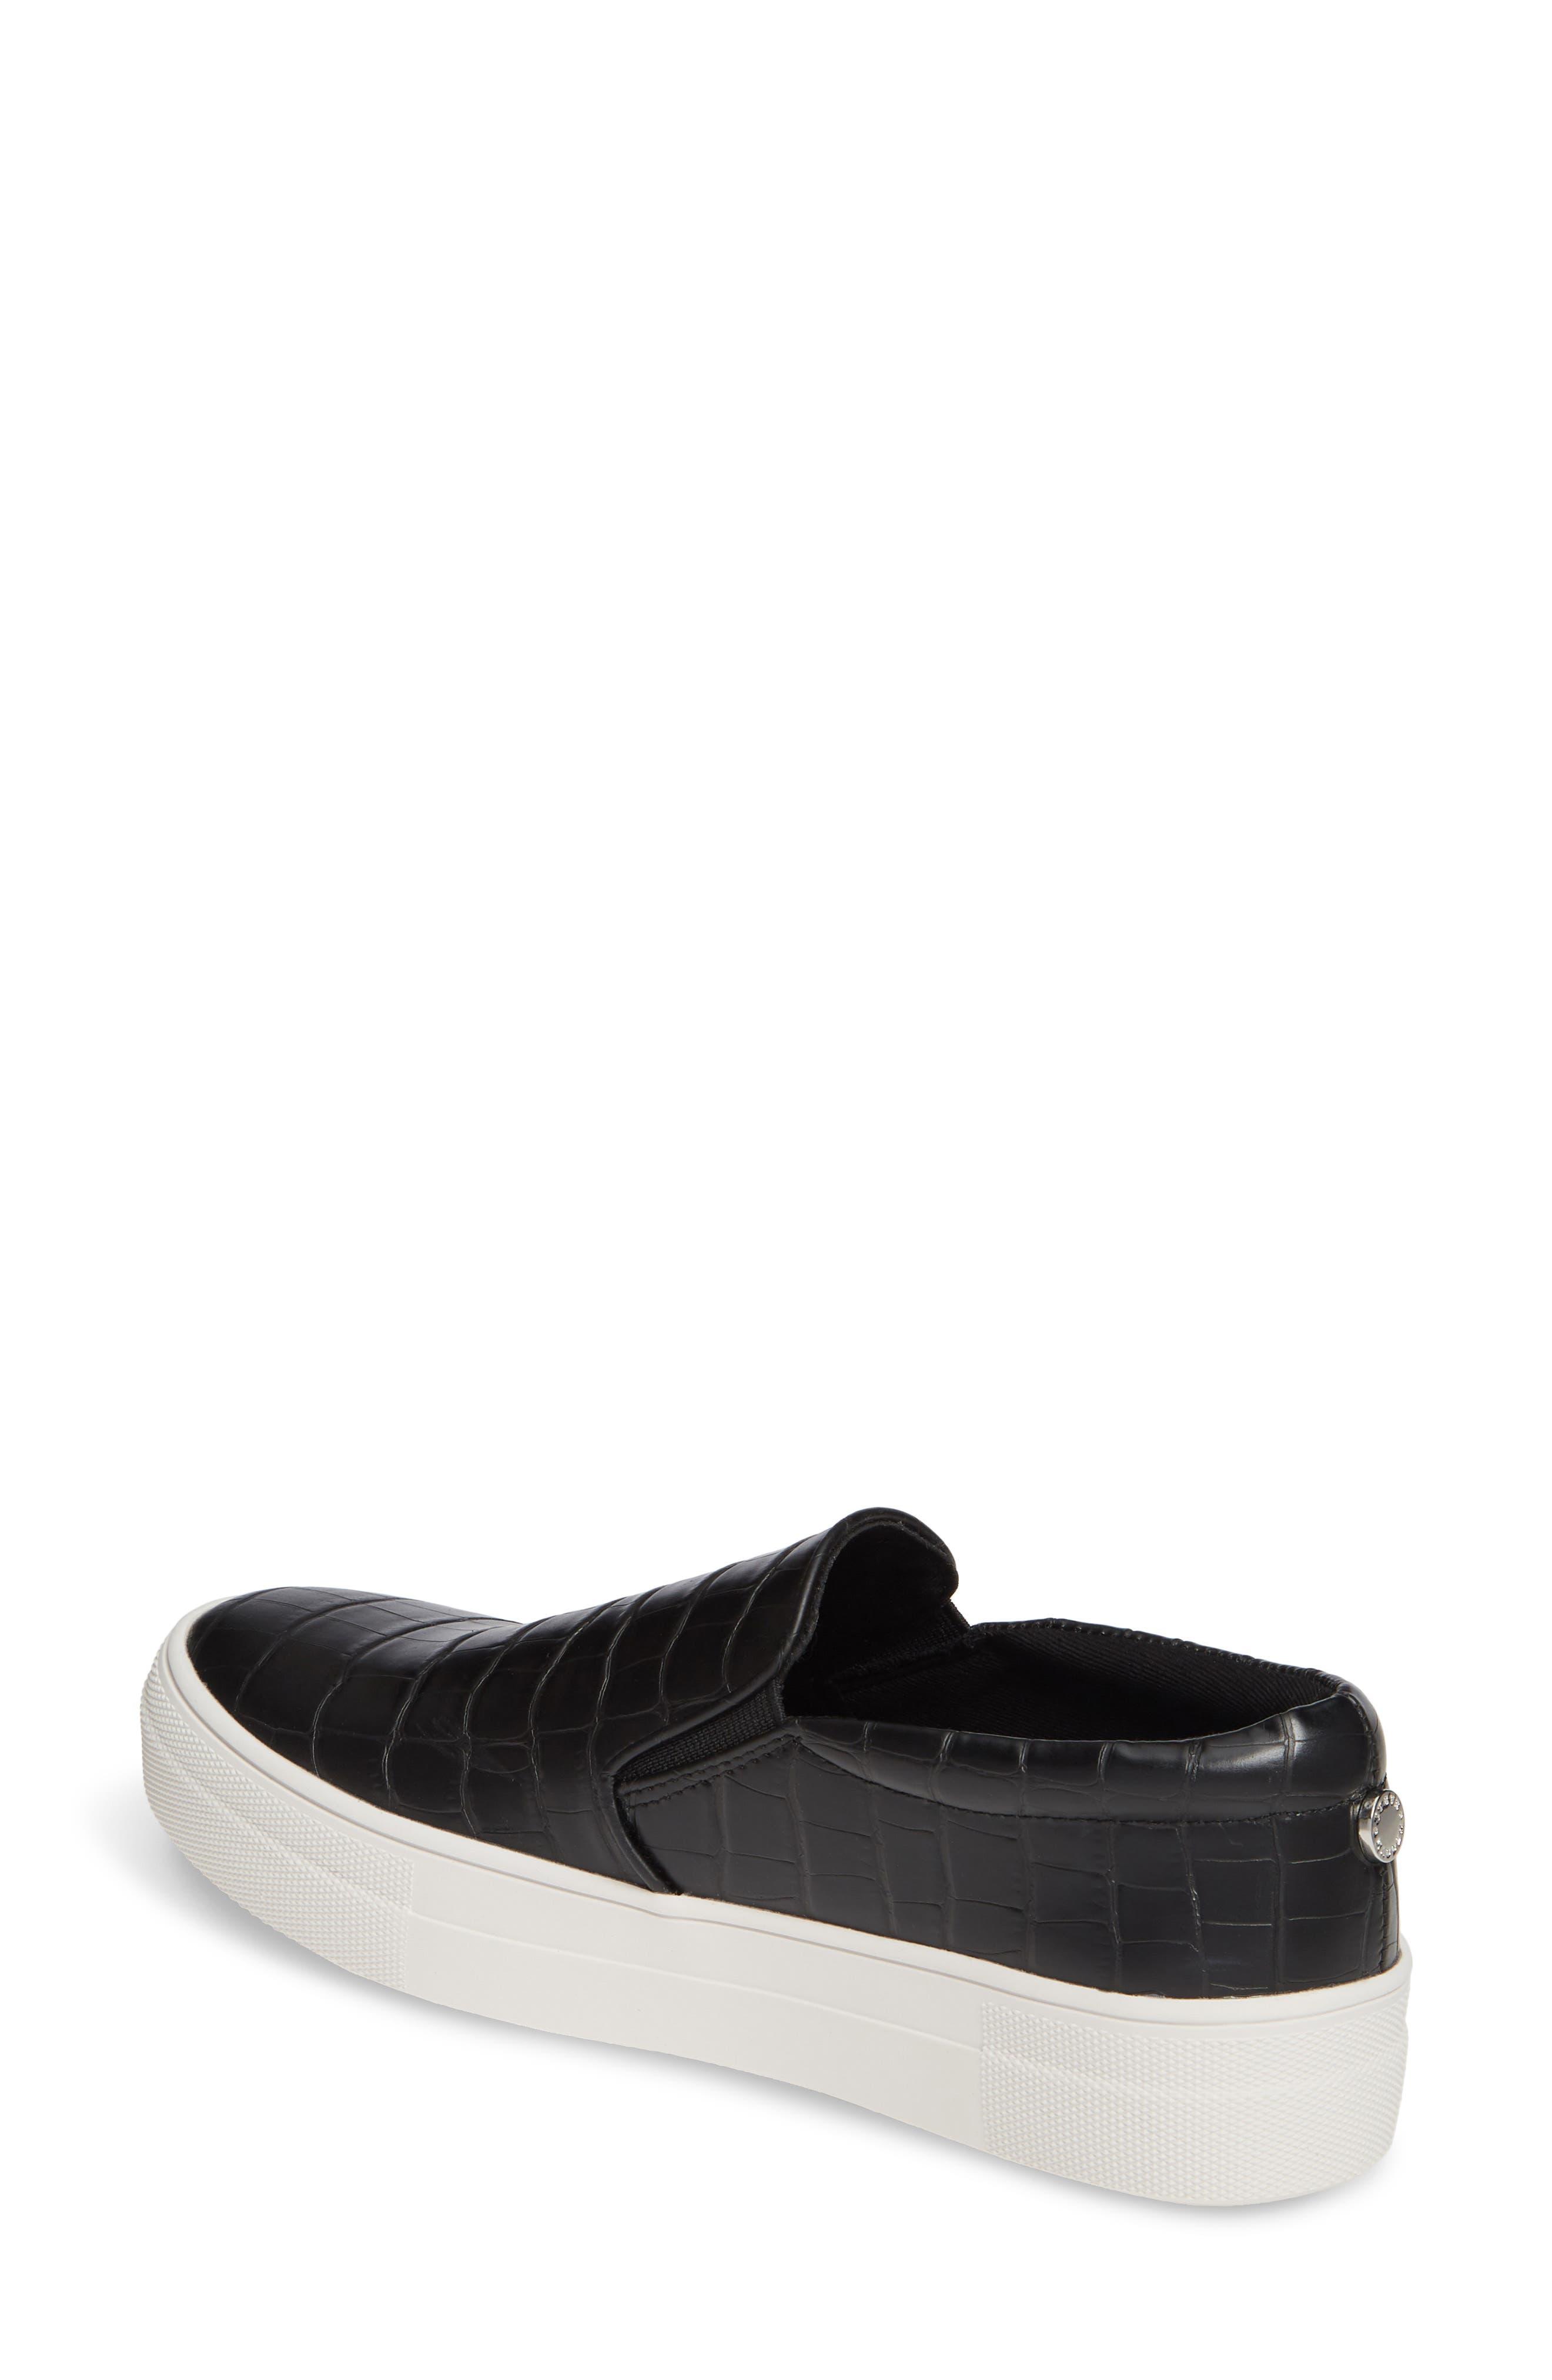 11d6c013c44 Women s Steve Madden Sneakers   Running Shoes